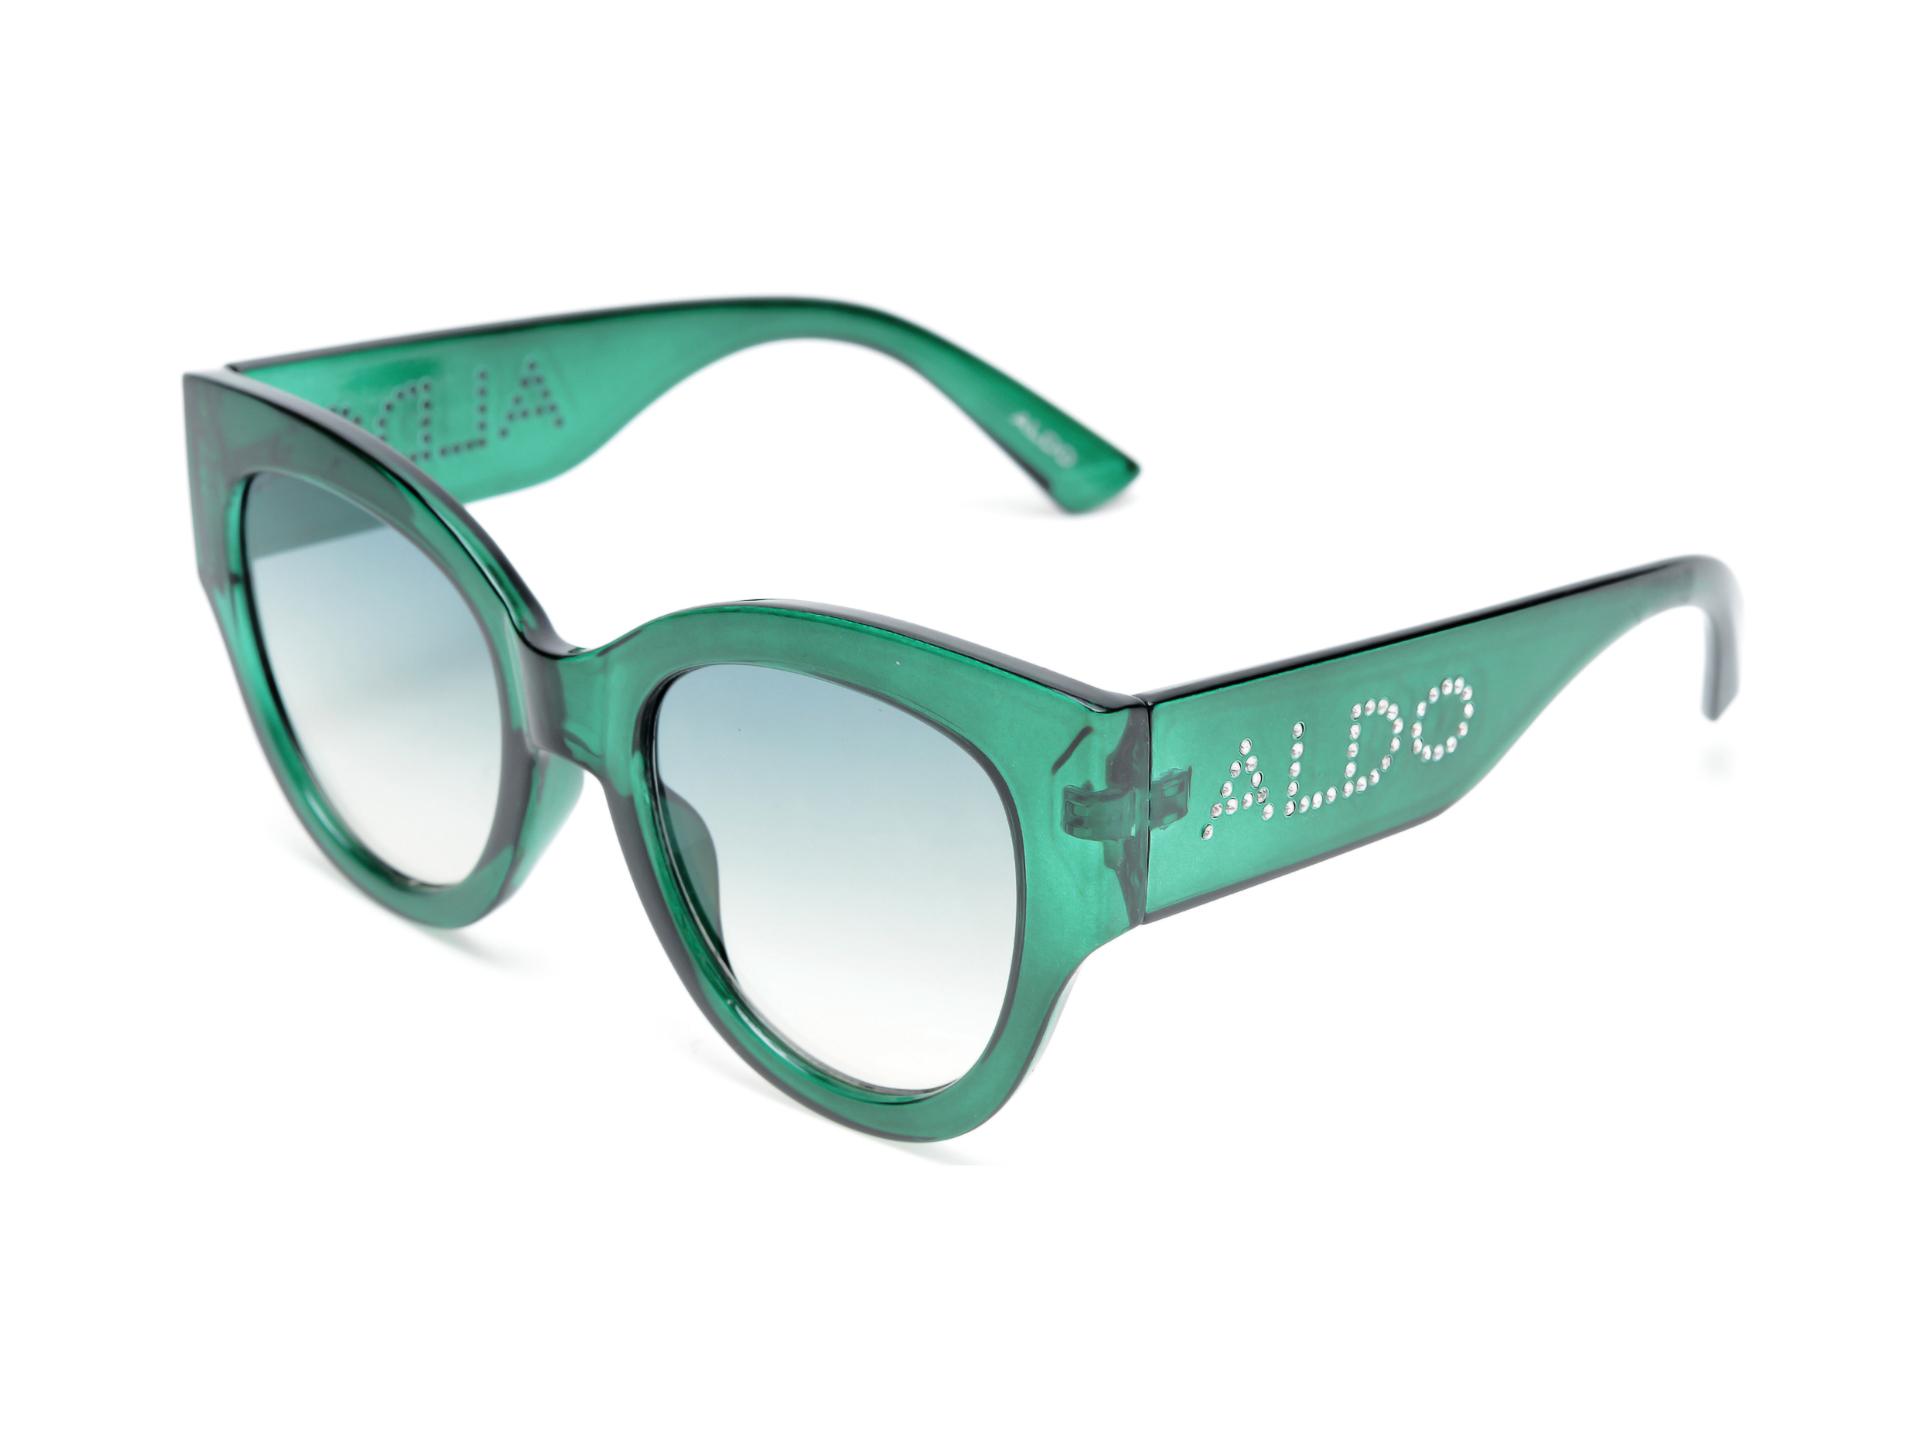 Ochelari de soare ALDO verzi, Matar300, din pvc imagine otter.ro 2021